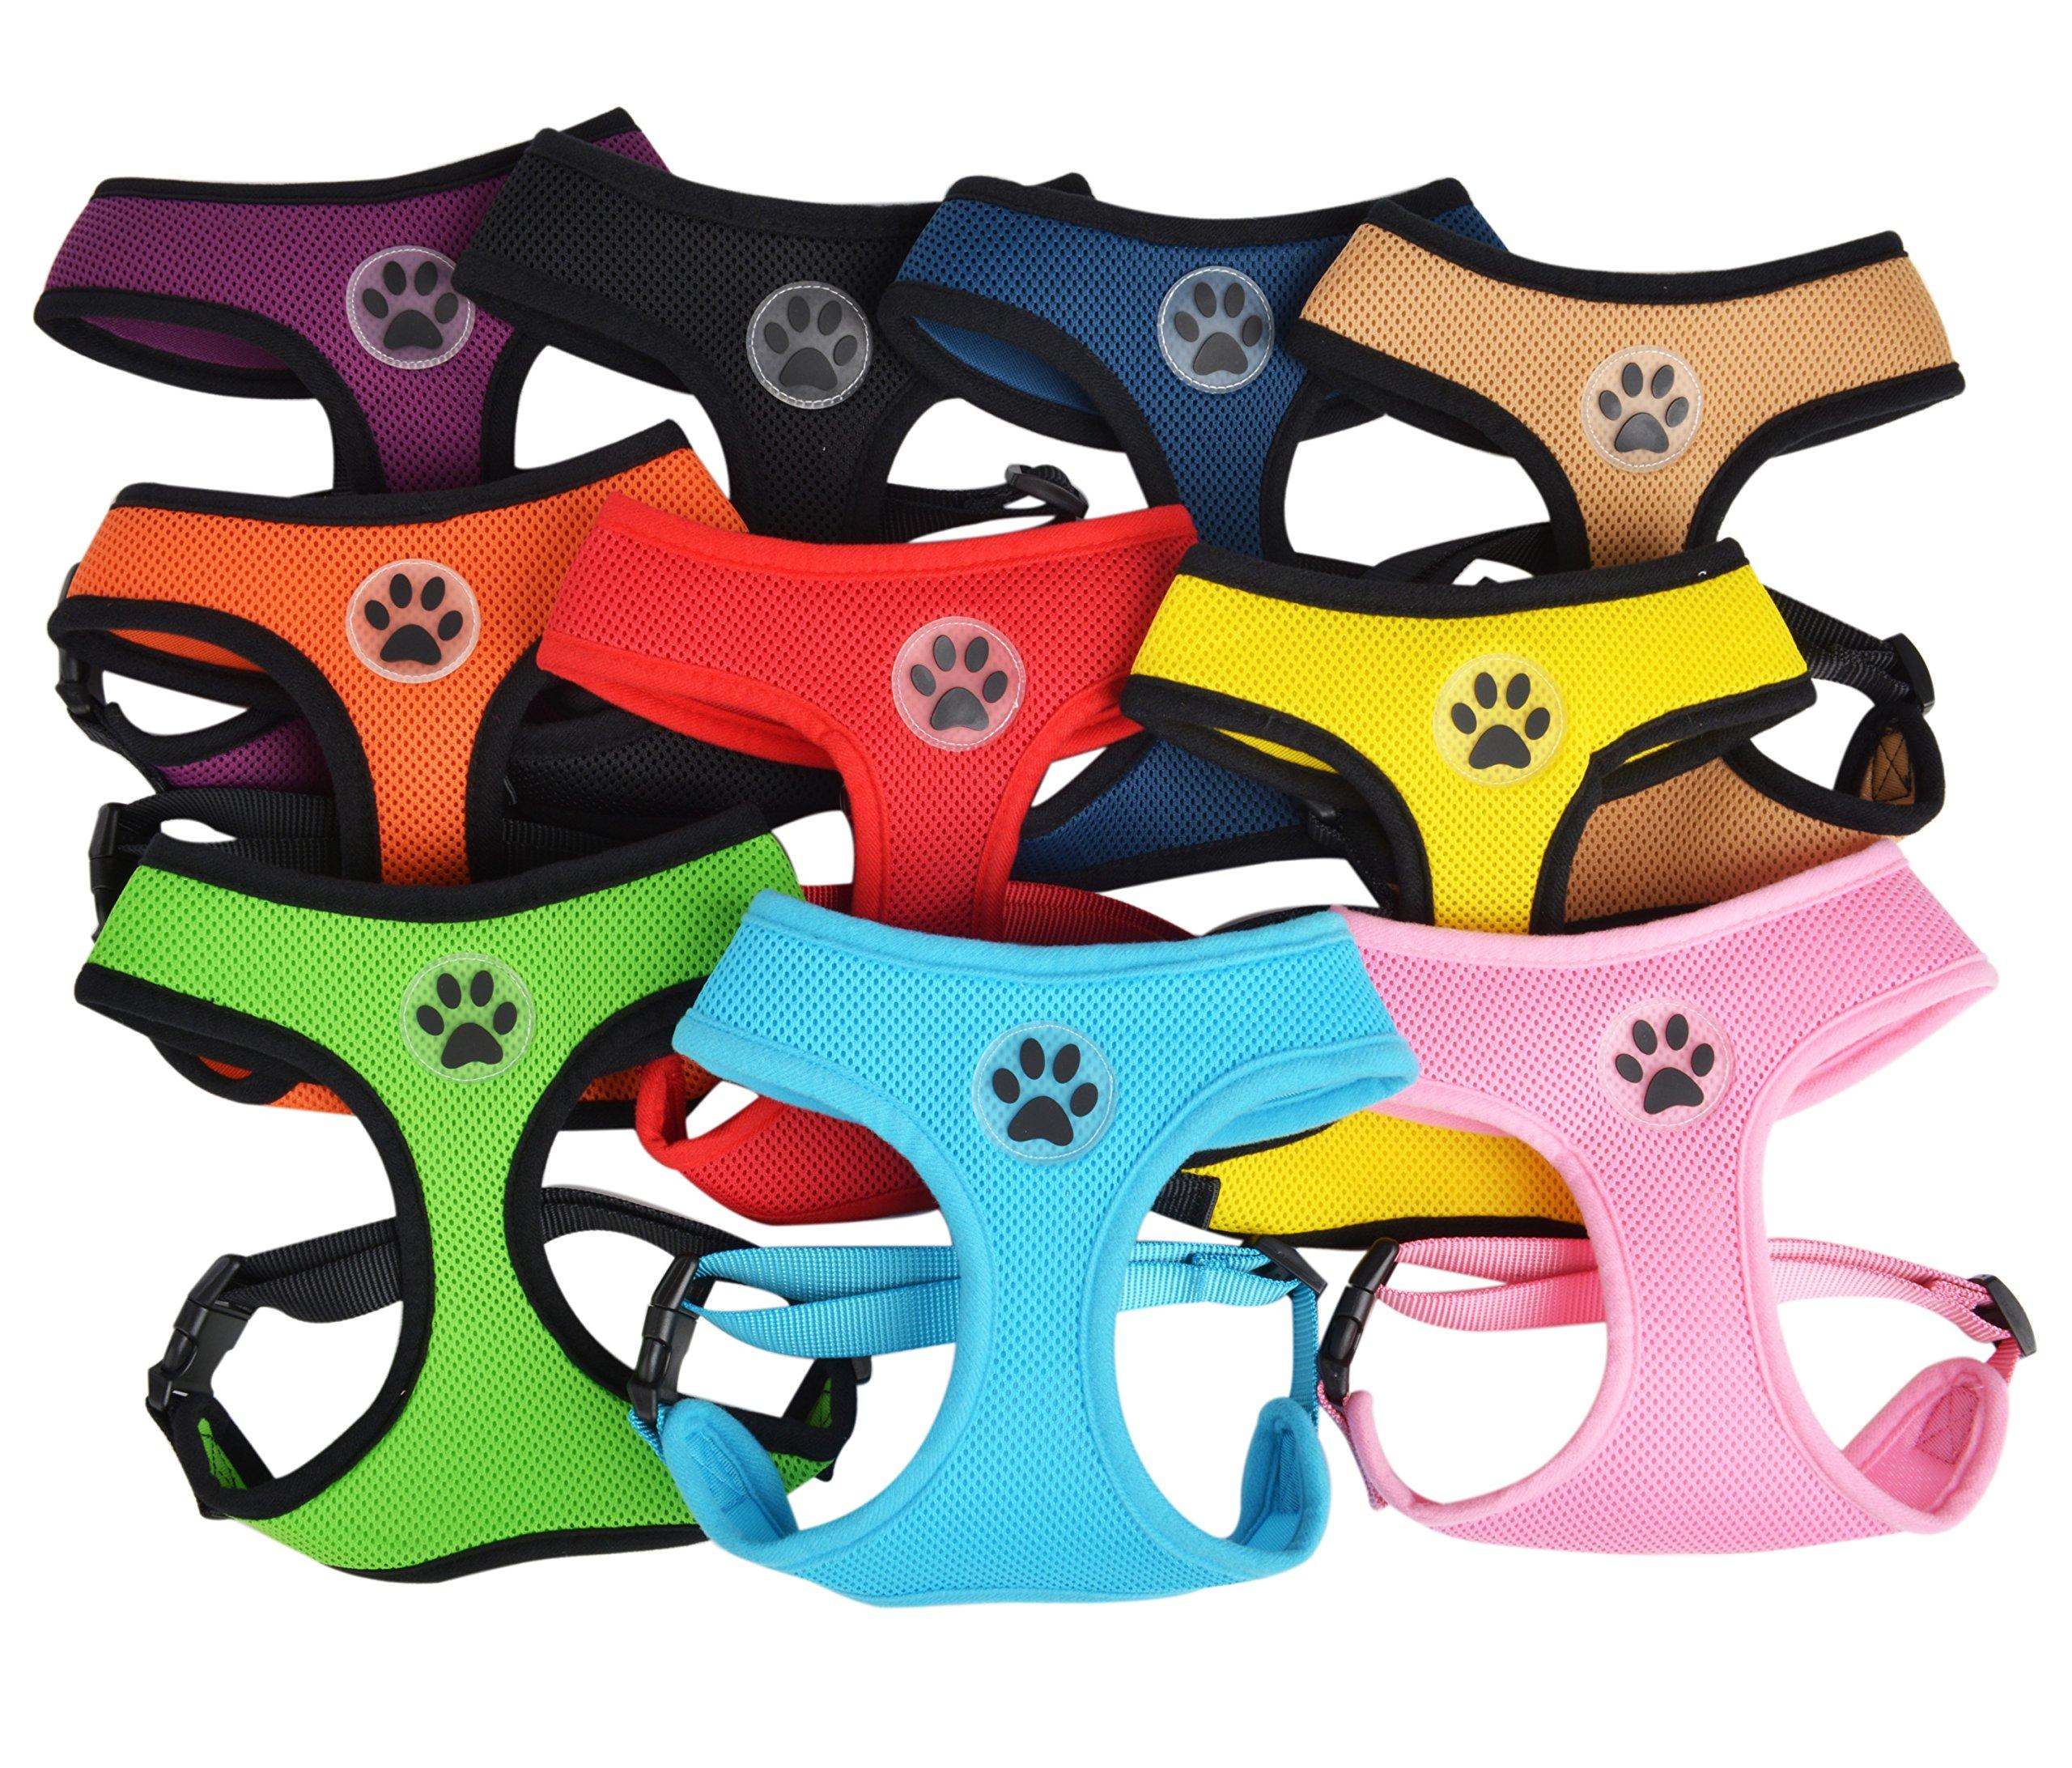 BINGPET BB5001 Soft Mesh Dog Harness Pet Walking Vest Puppy Padded Harnesses Adjustable, Blue Large by BINGPET (Image #5)